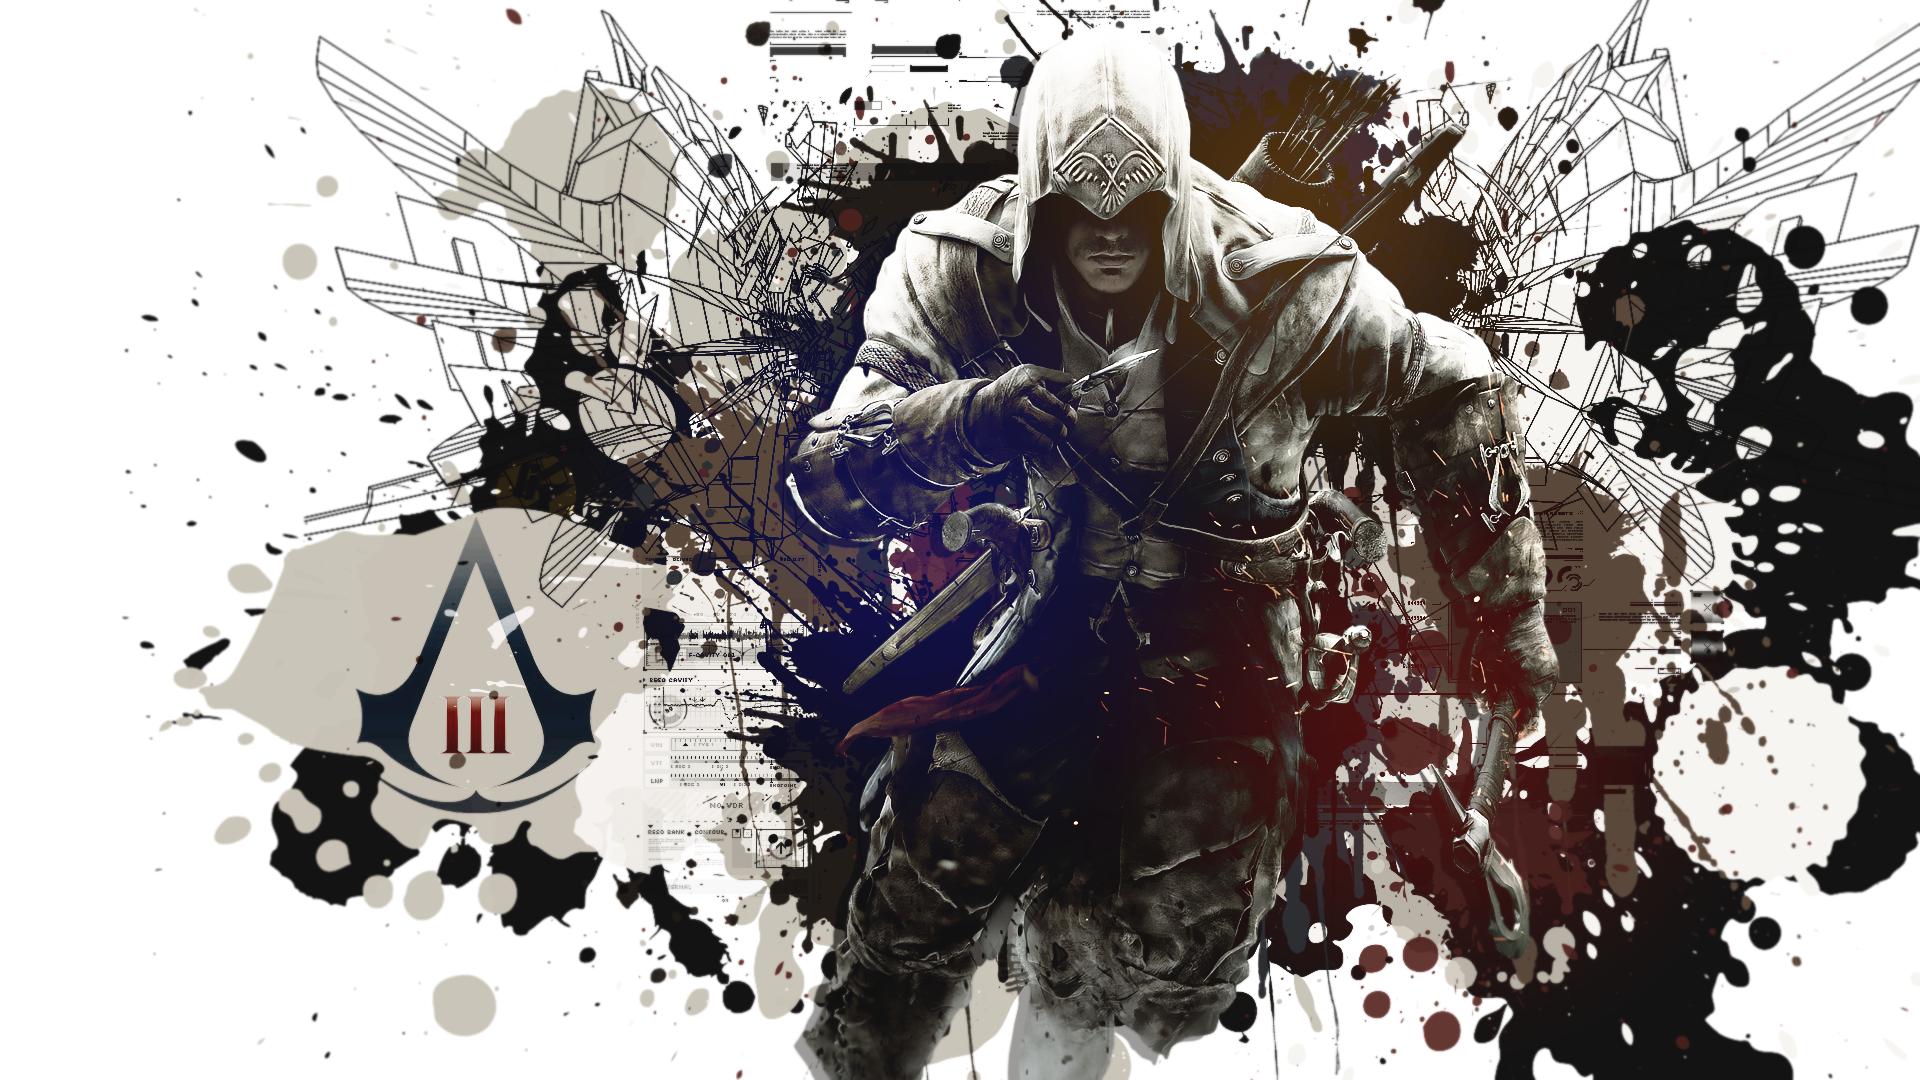 Assasins Creed 3 Wallpaper 1080p By Gigy1996 On Deviantart